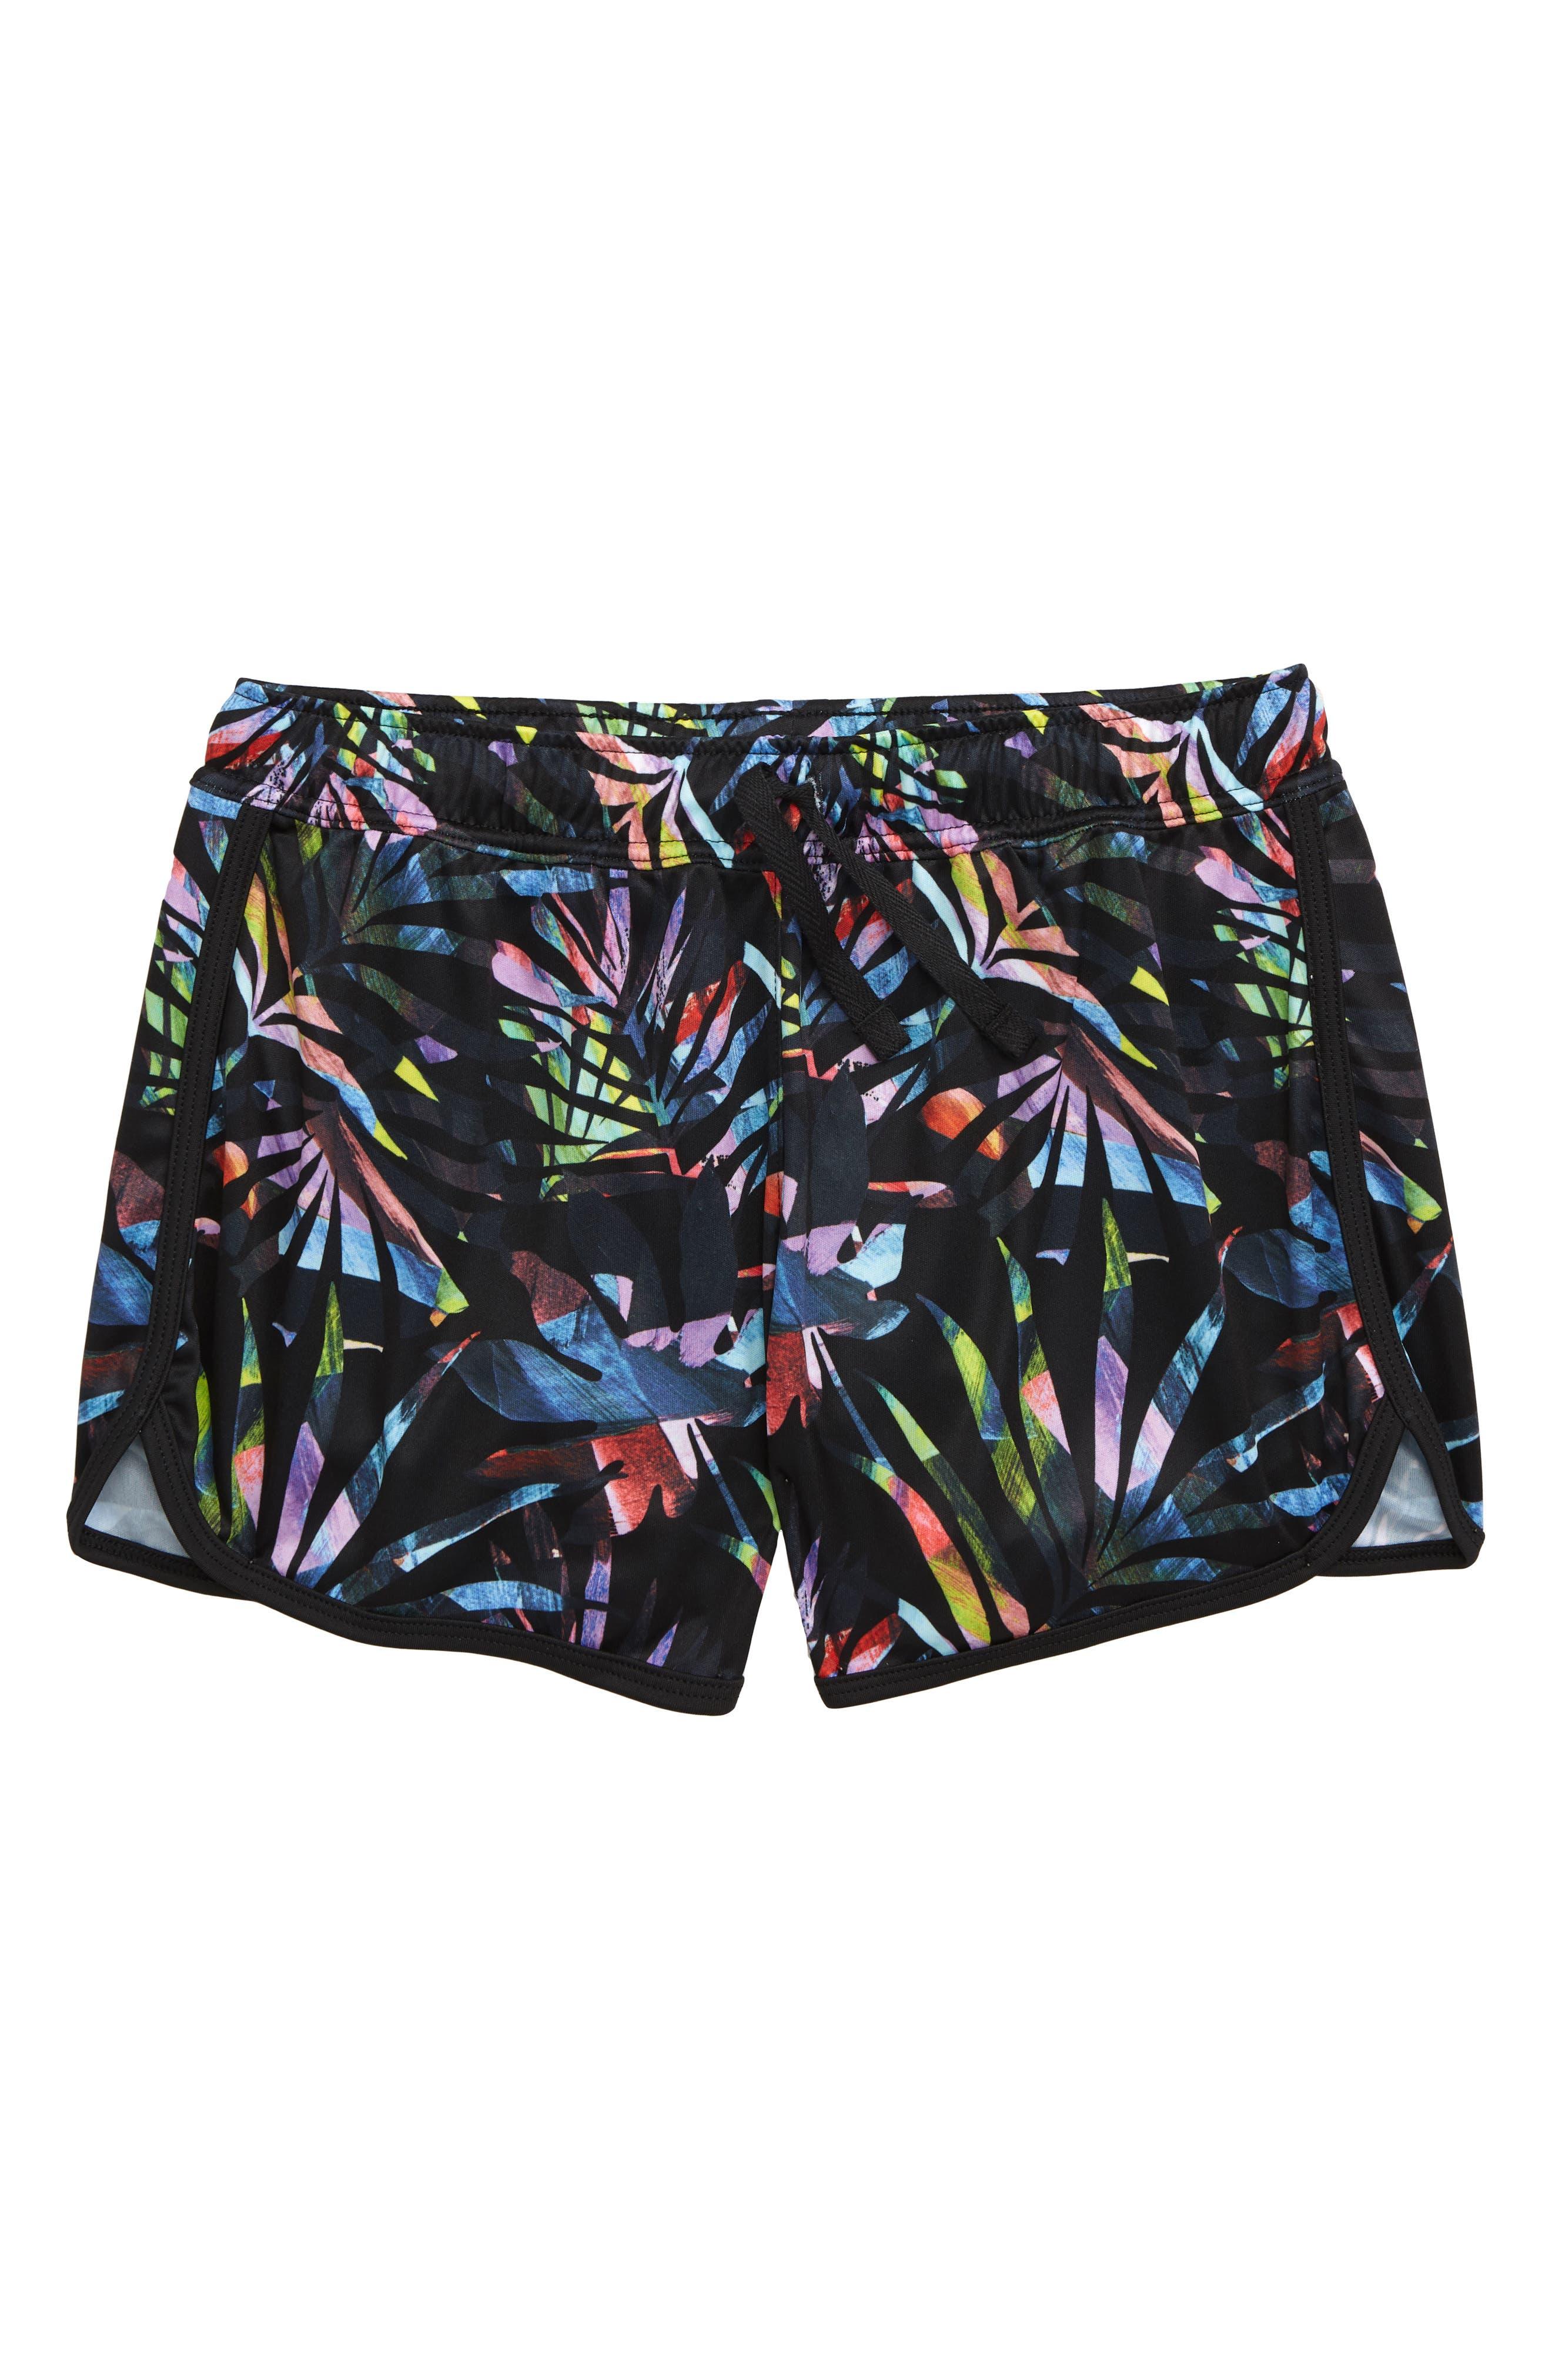 ZELLA GIRL Zephyr Print Shorts, Main, color, BLACK MULTI WATERCOLOR FROND